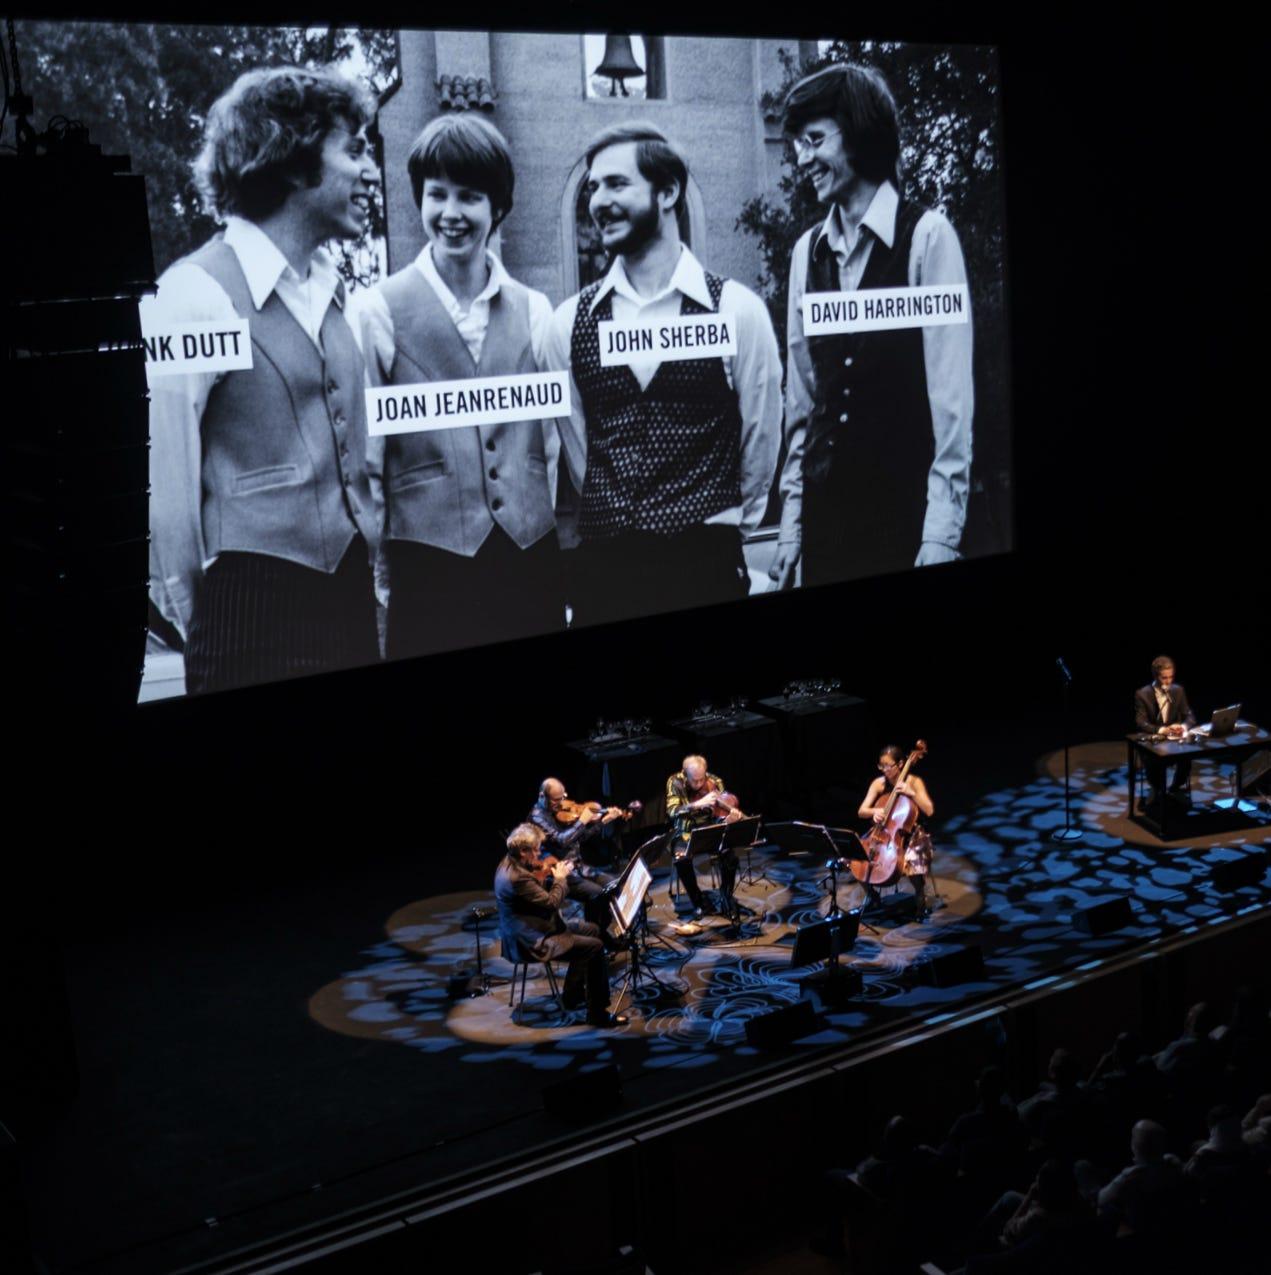 Kronos Quartet performance at Freep Film Festival blends documentary with live music